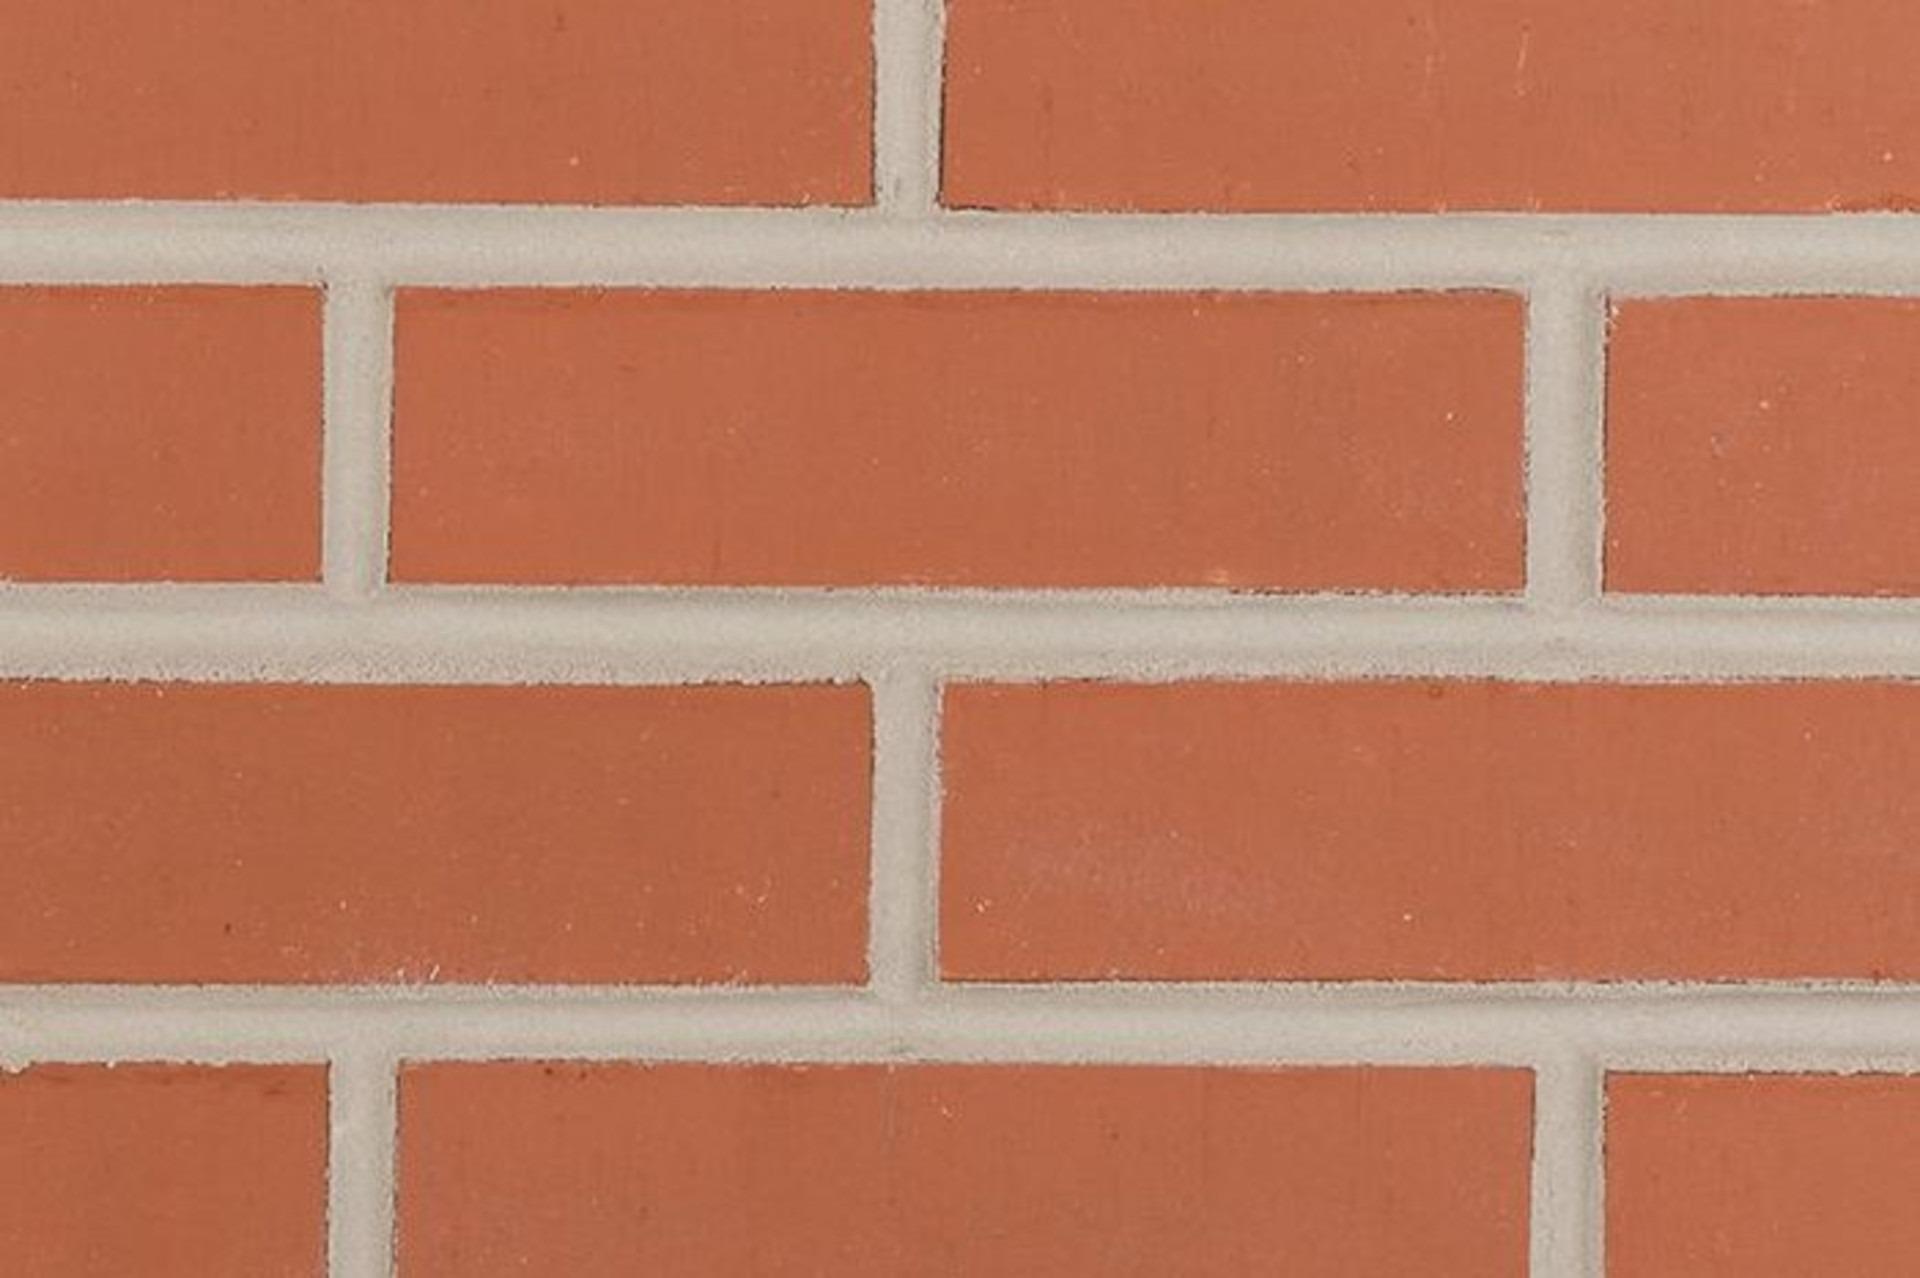 Texas Red Common Modular Brick